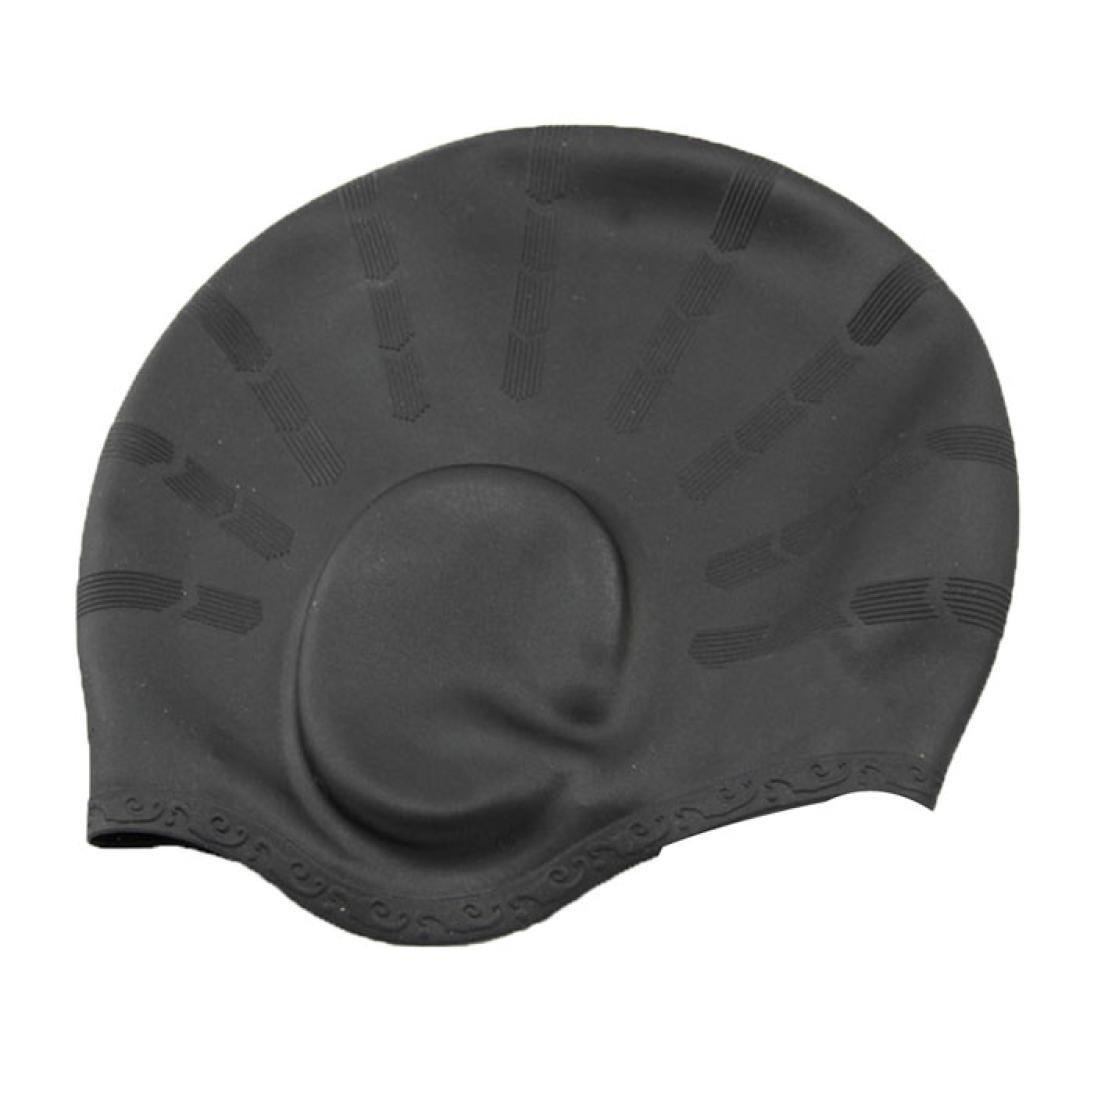 Ama ( TM )メンズレディース大人用シリコン防水Swim Cap Covers耳水泳Bathing帽子  ブラック B01KZ1AAYE